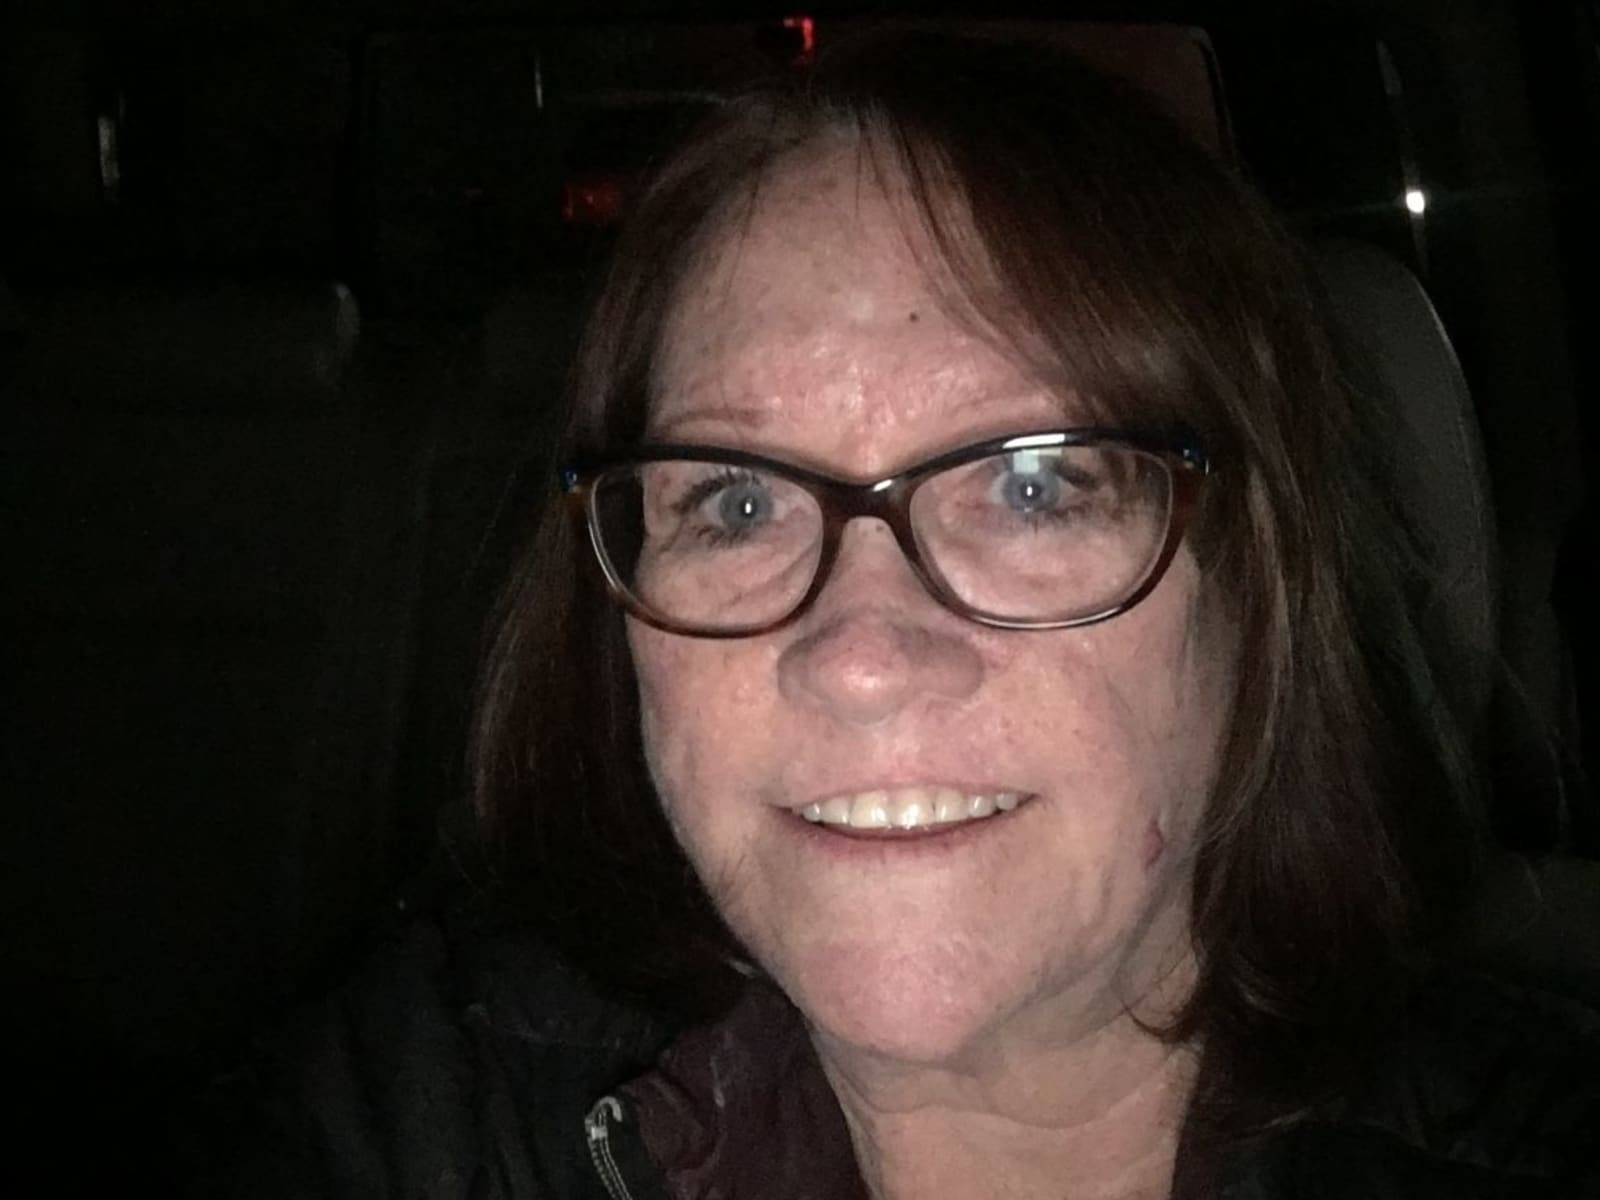 Deborah from Reno, Nevada, United States